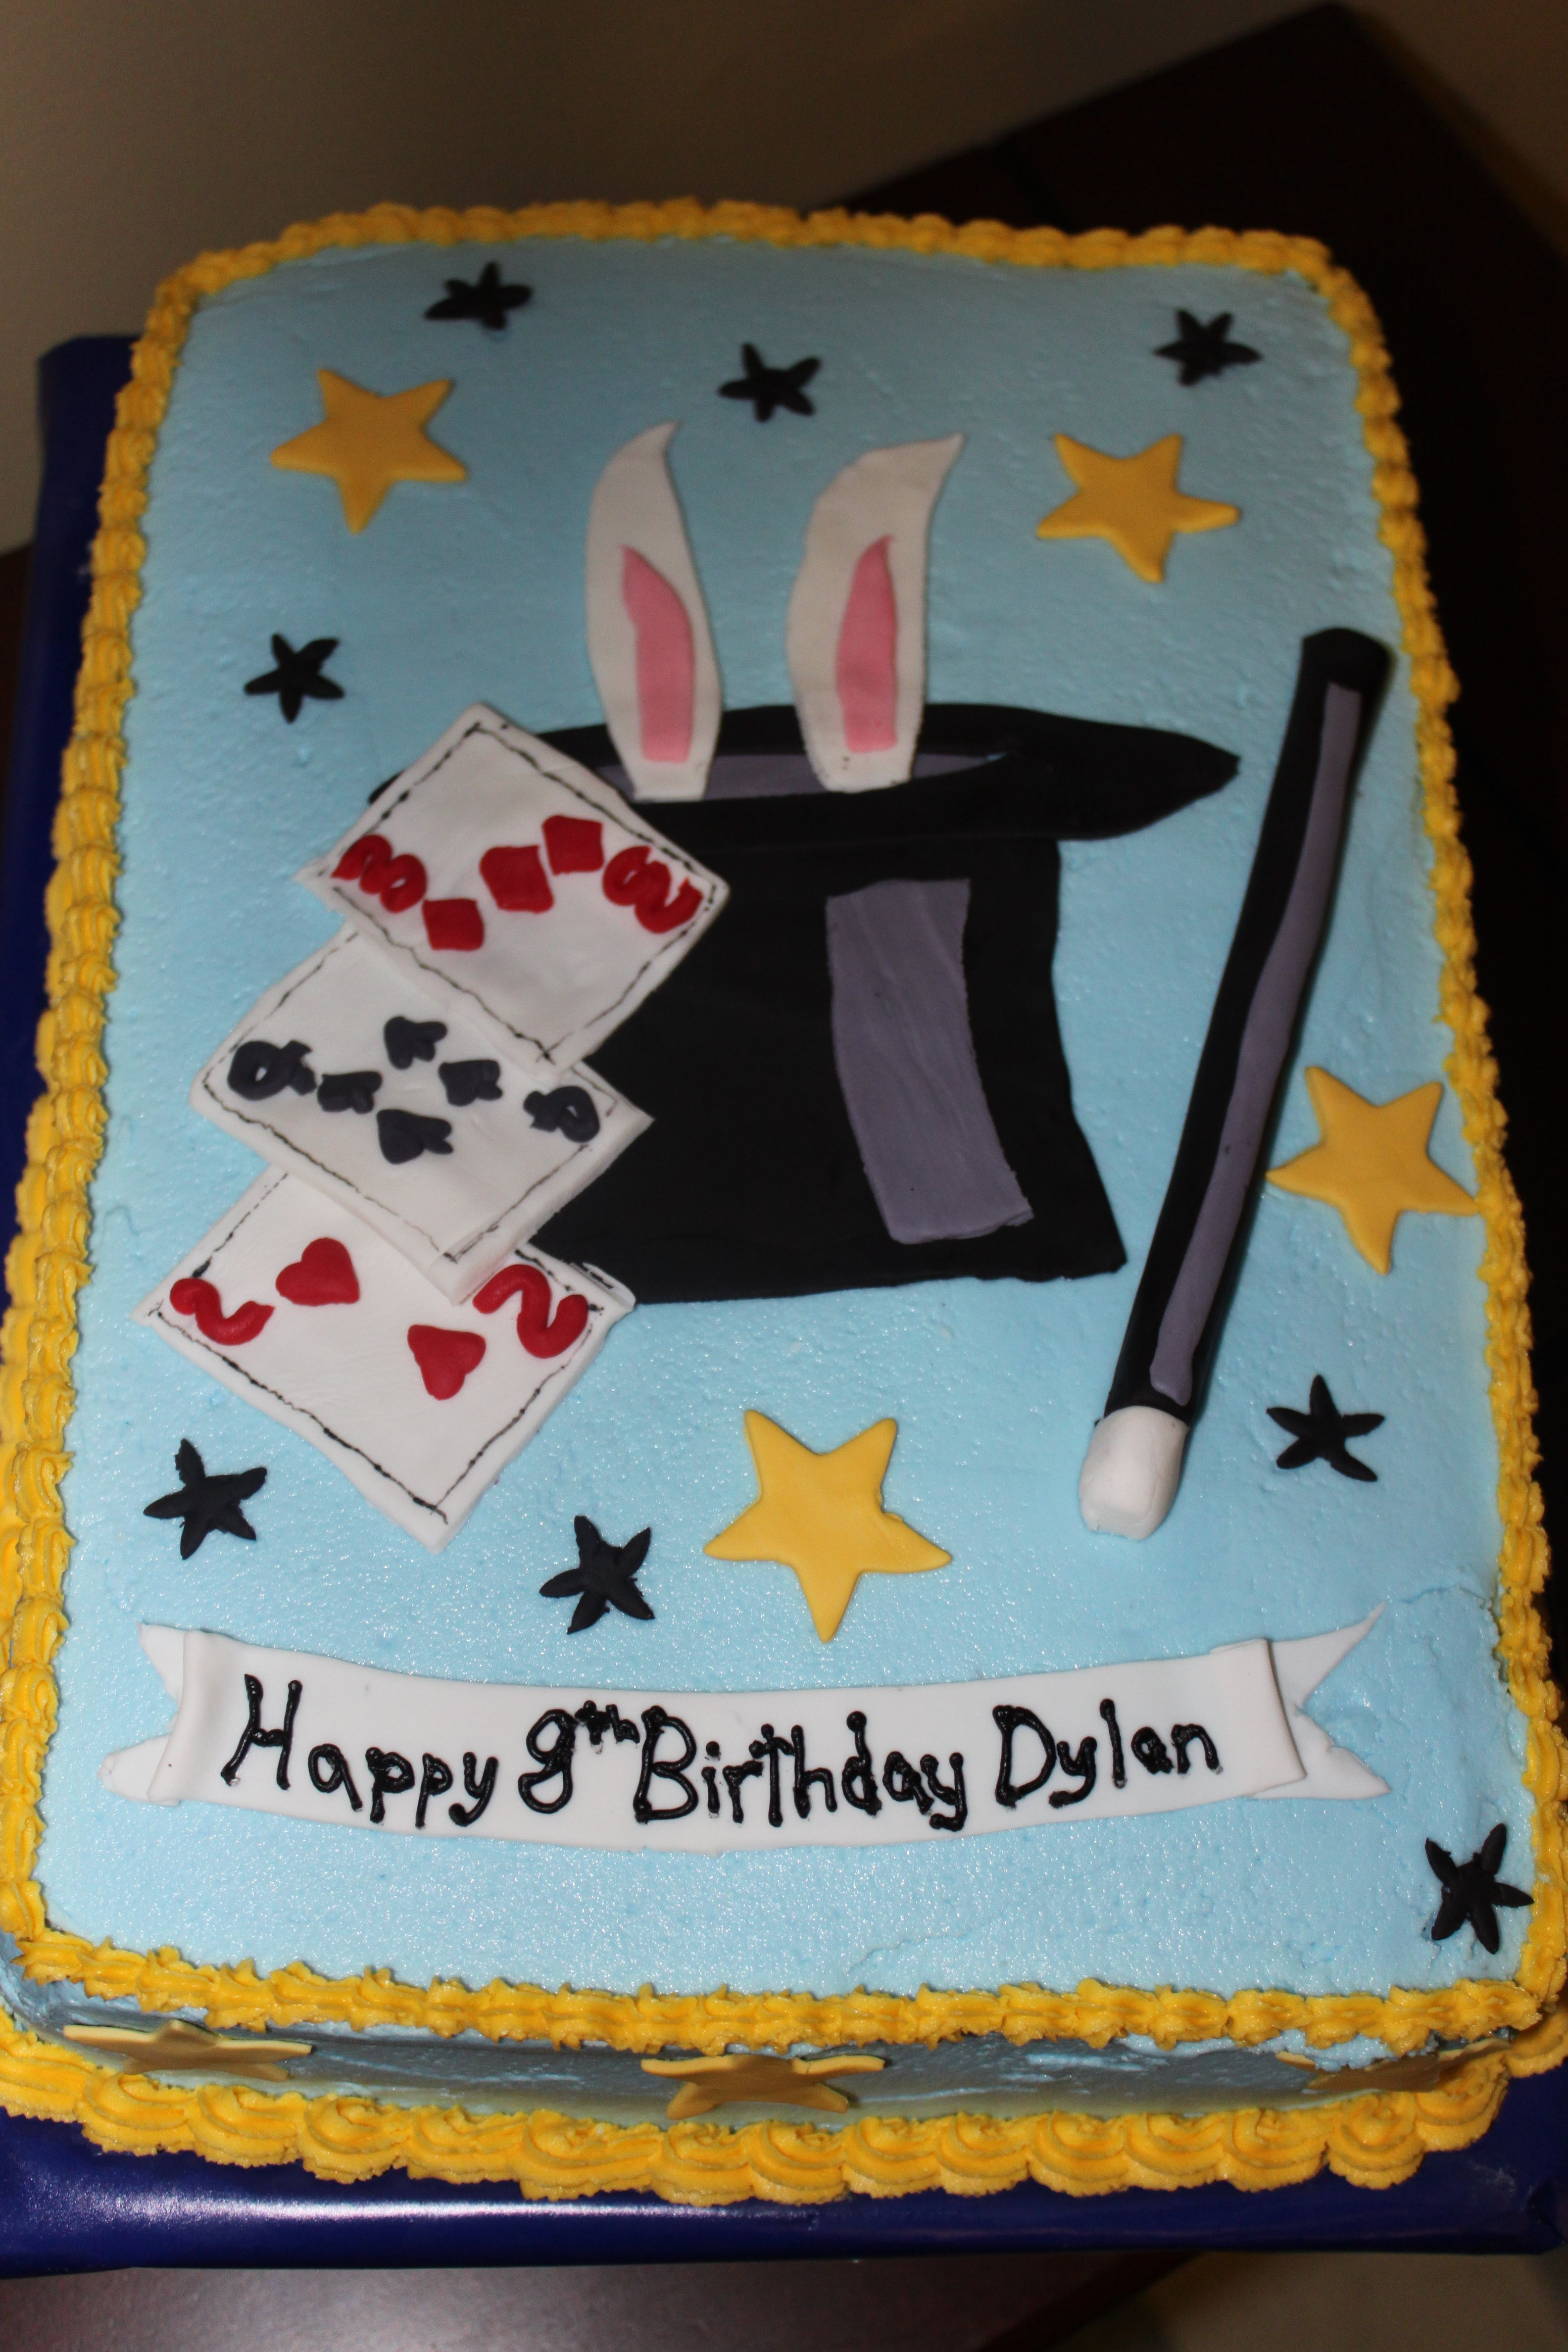 Phenomenal Magician Cake With Images Magic Birthday Party Magic Birthday Funny Birthday Cards Online Kookostrdamsfinfo